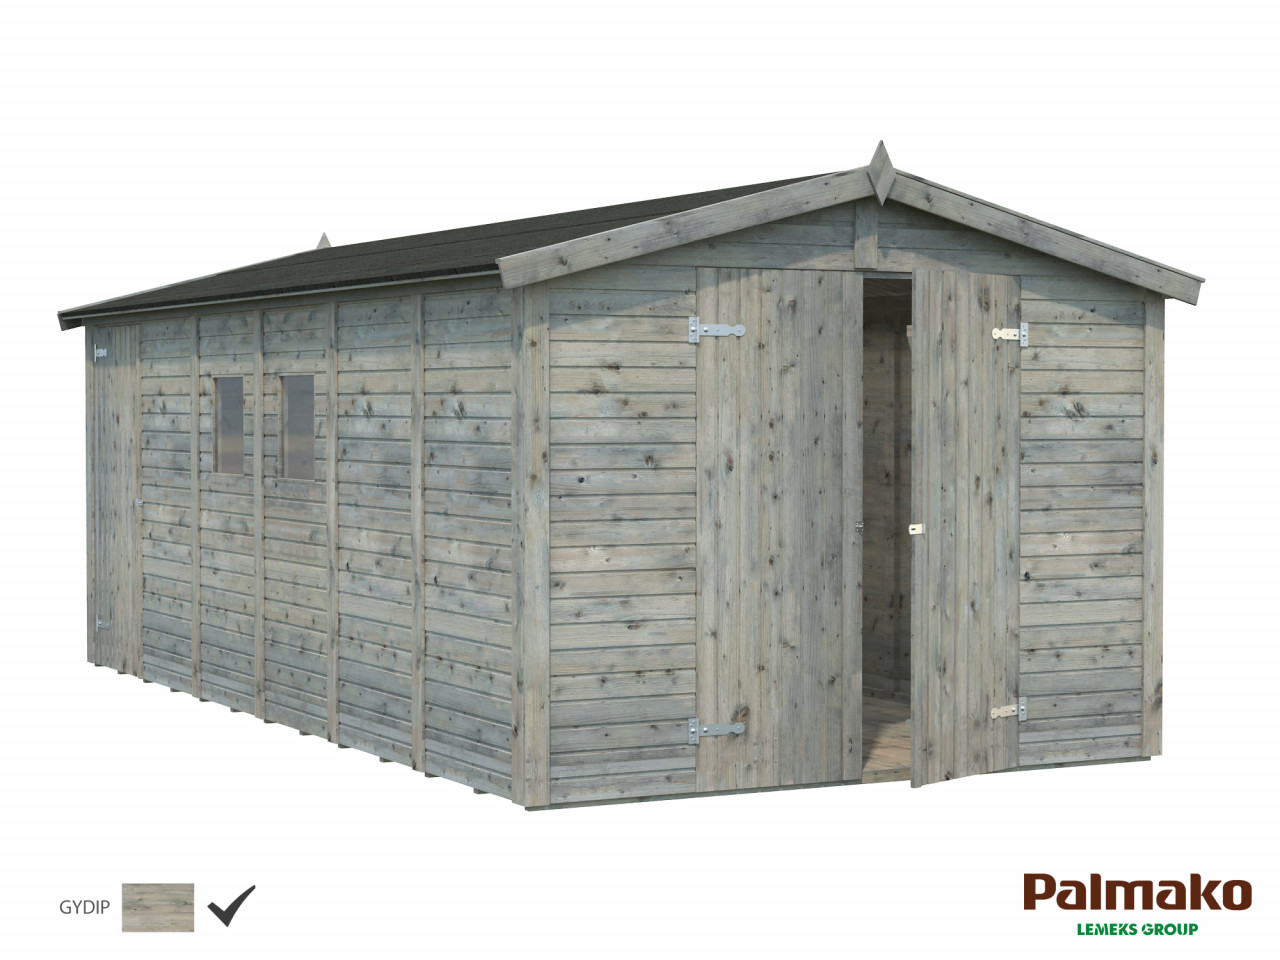 Palmako Gerätehaus Dan 14,7 m²